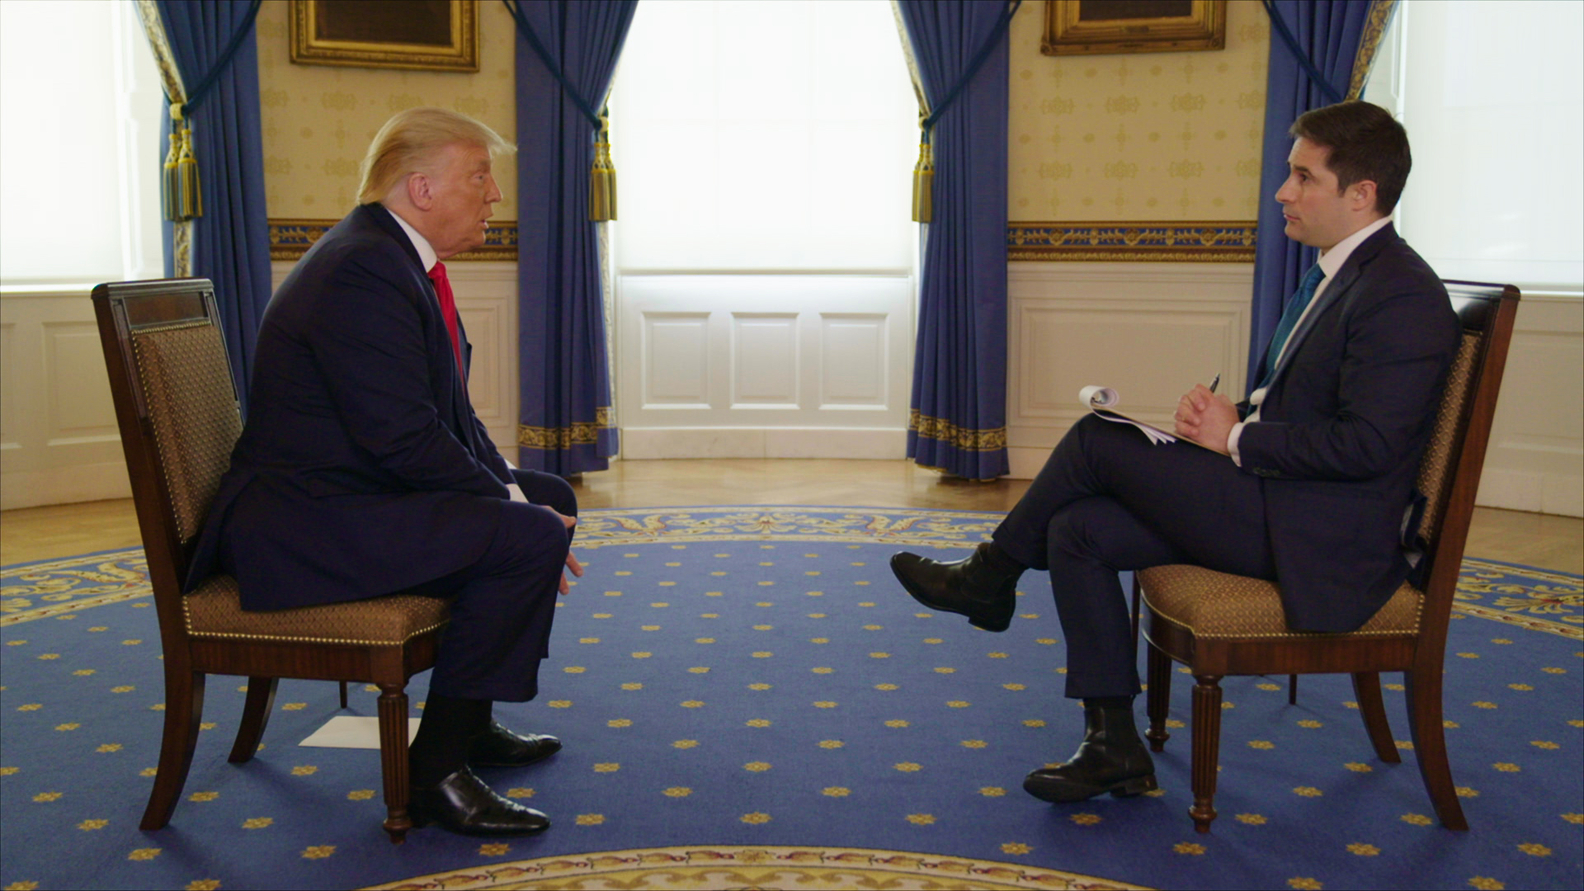 President Trump, Jonathan Swan